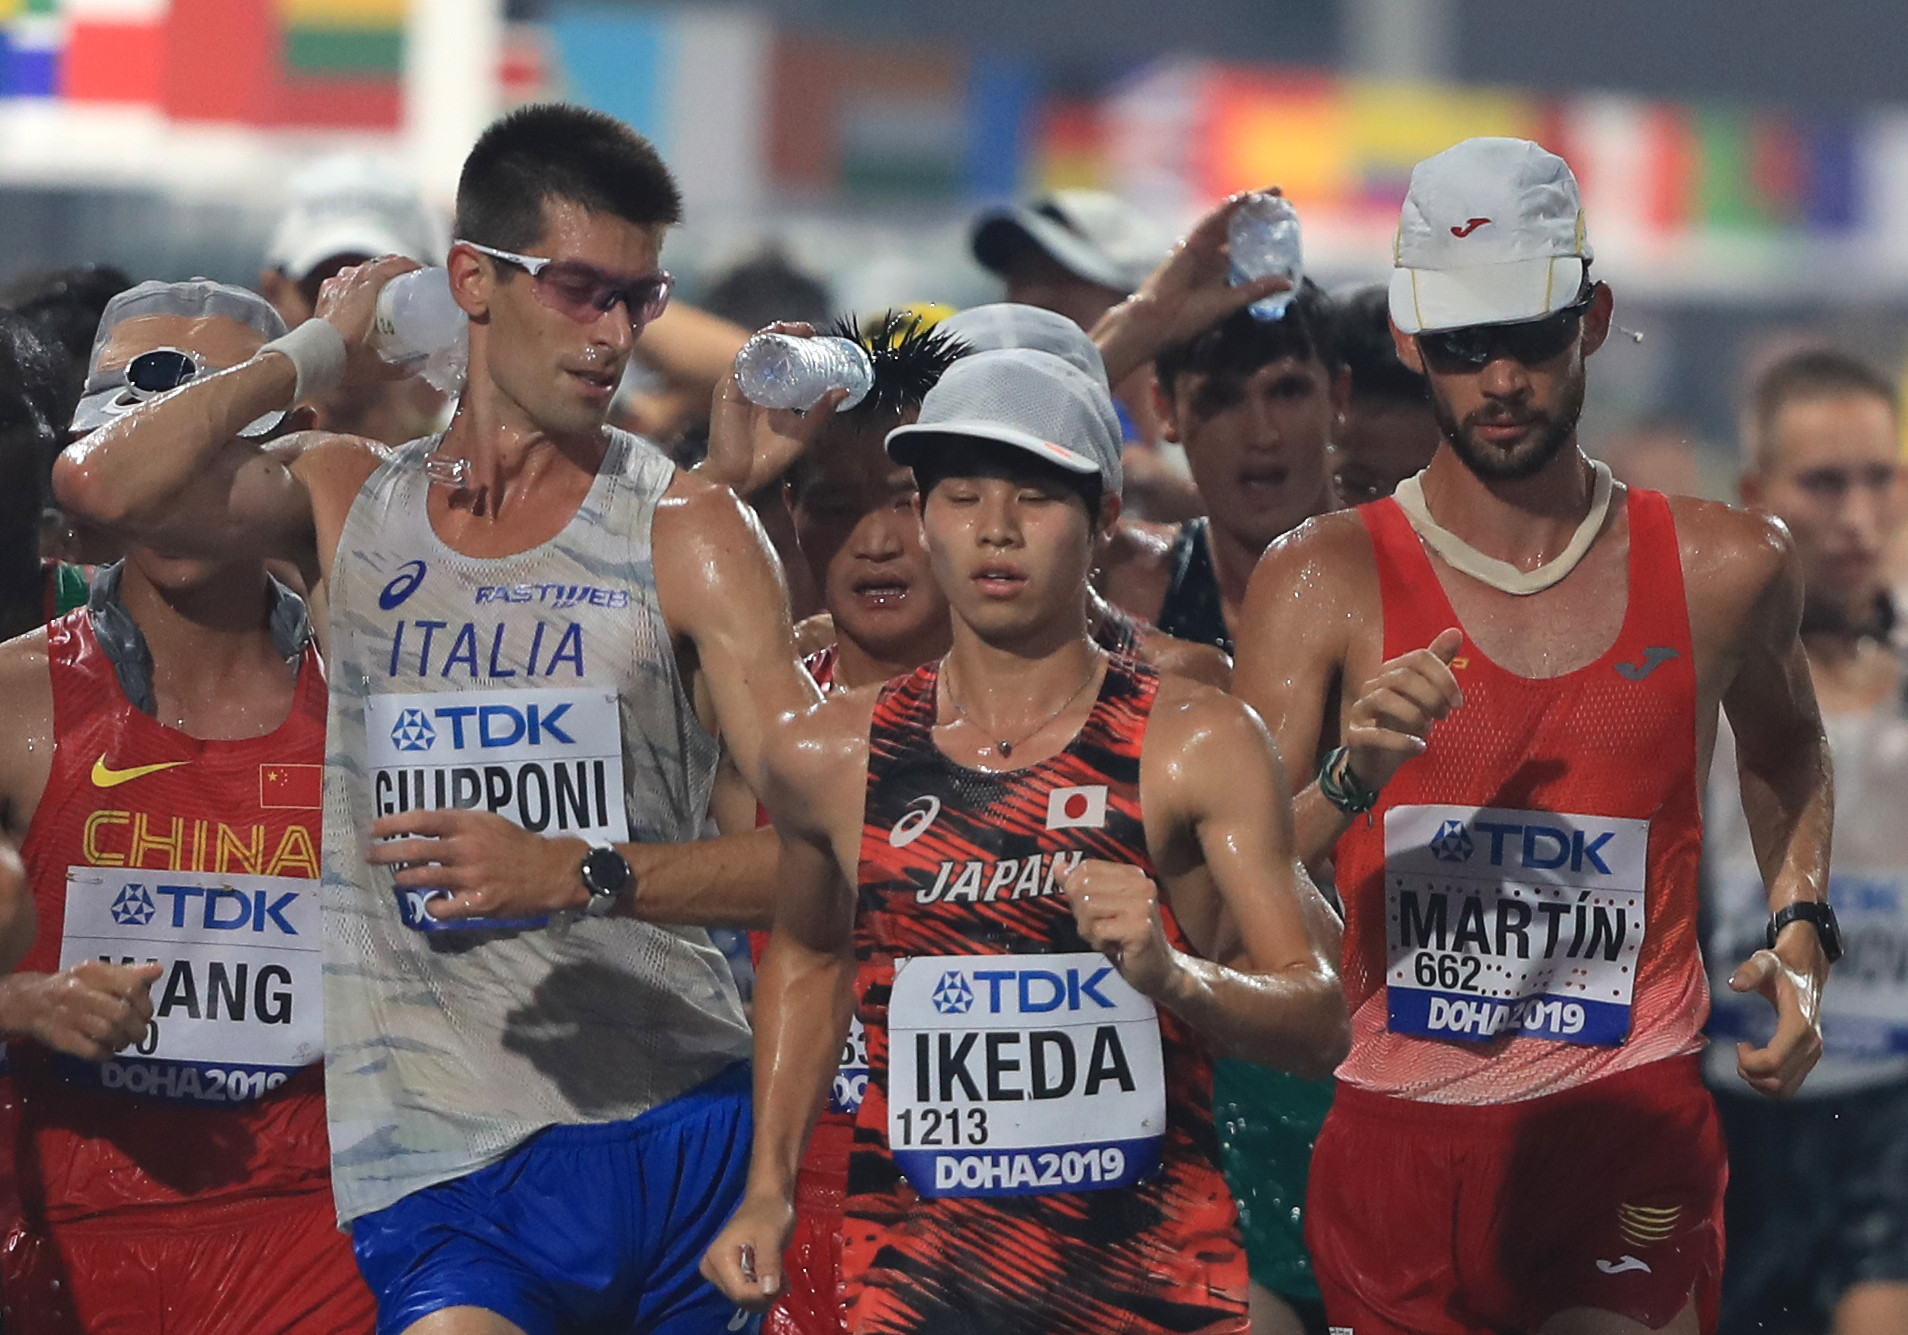 Mixed team race walking to debut at Paris 2024 Olympics